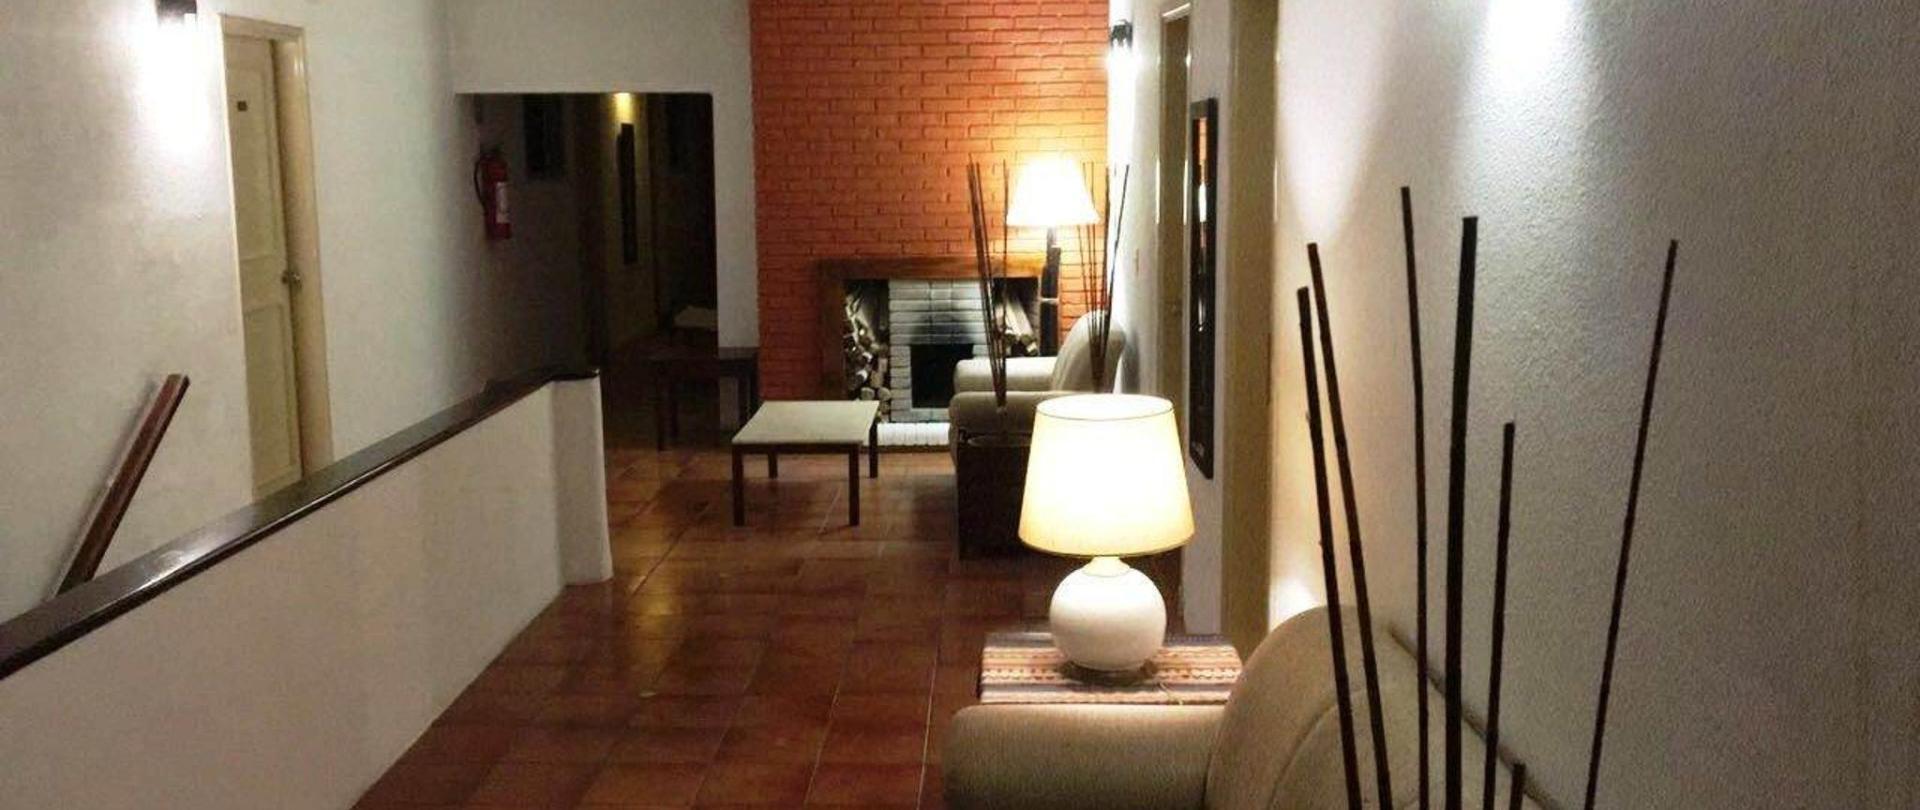 hotelo-pa5.jpg